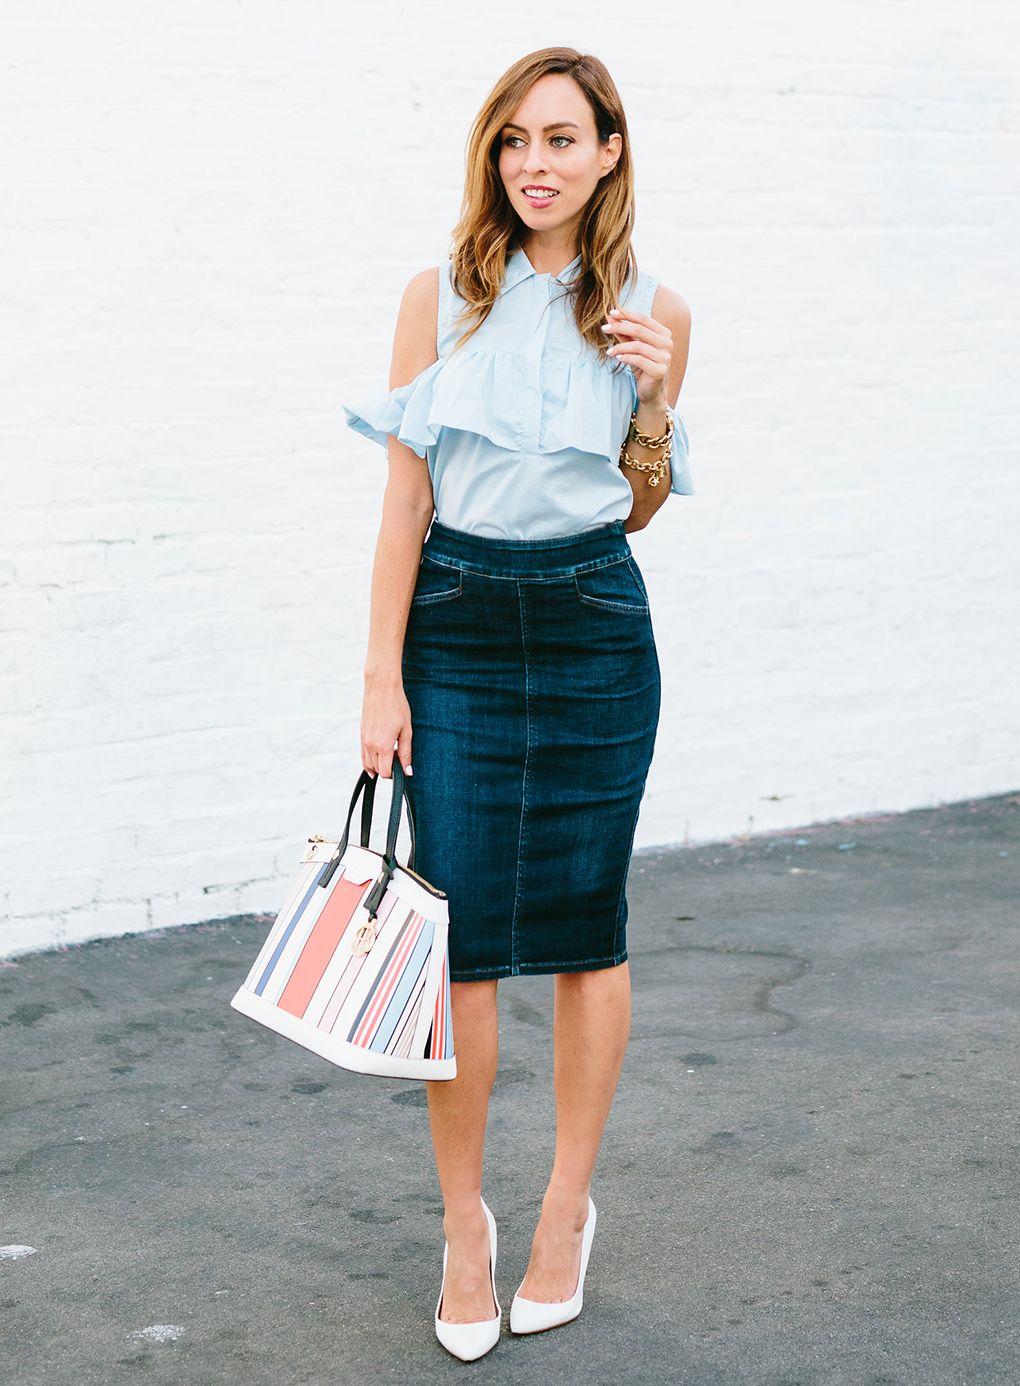 Fashion week Denim long skirt how to wear for woman